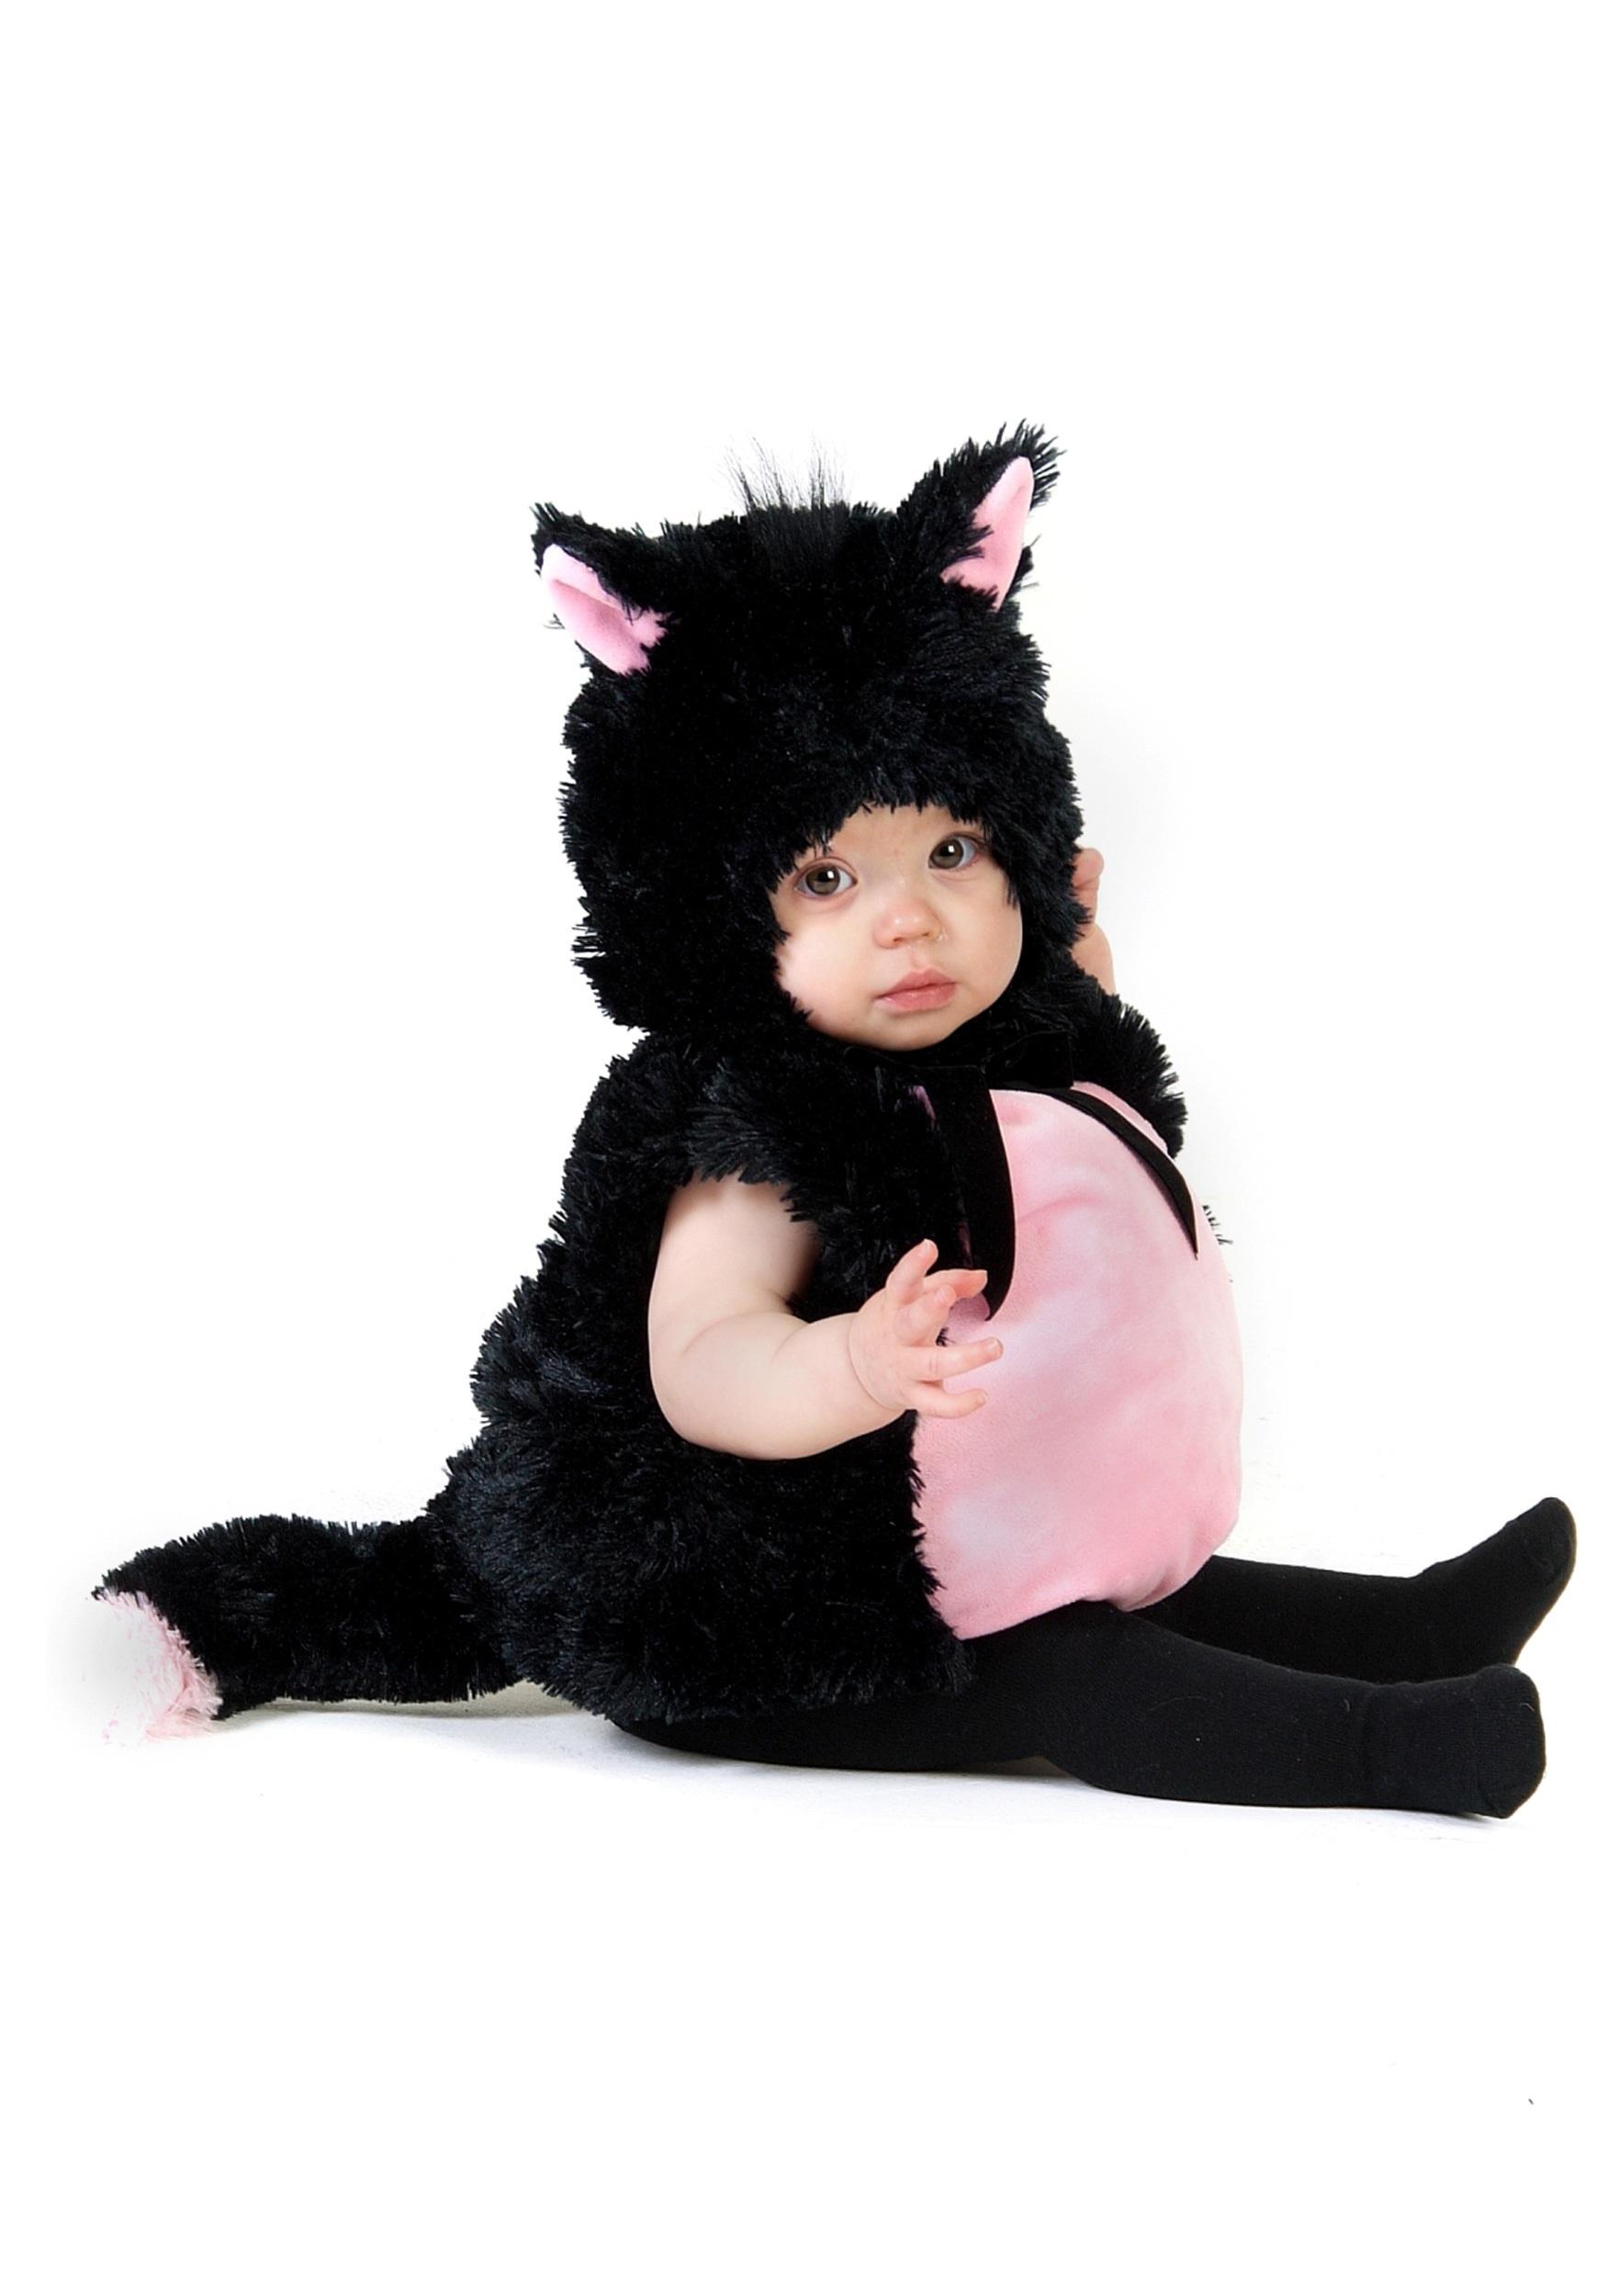 Plump Baby Kitty Costume for Girls